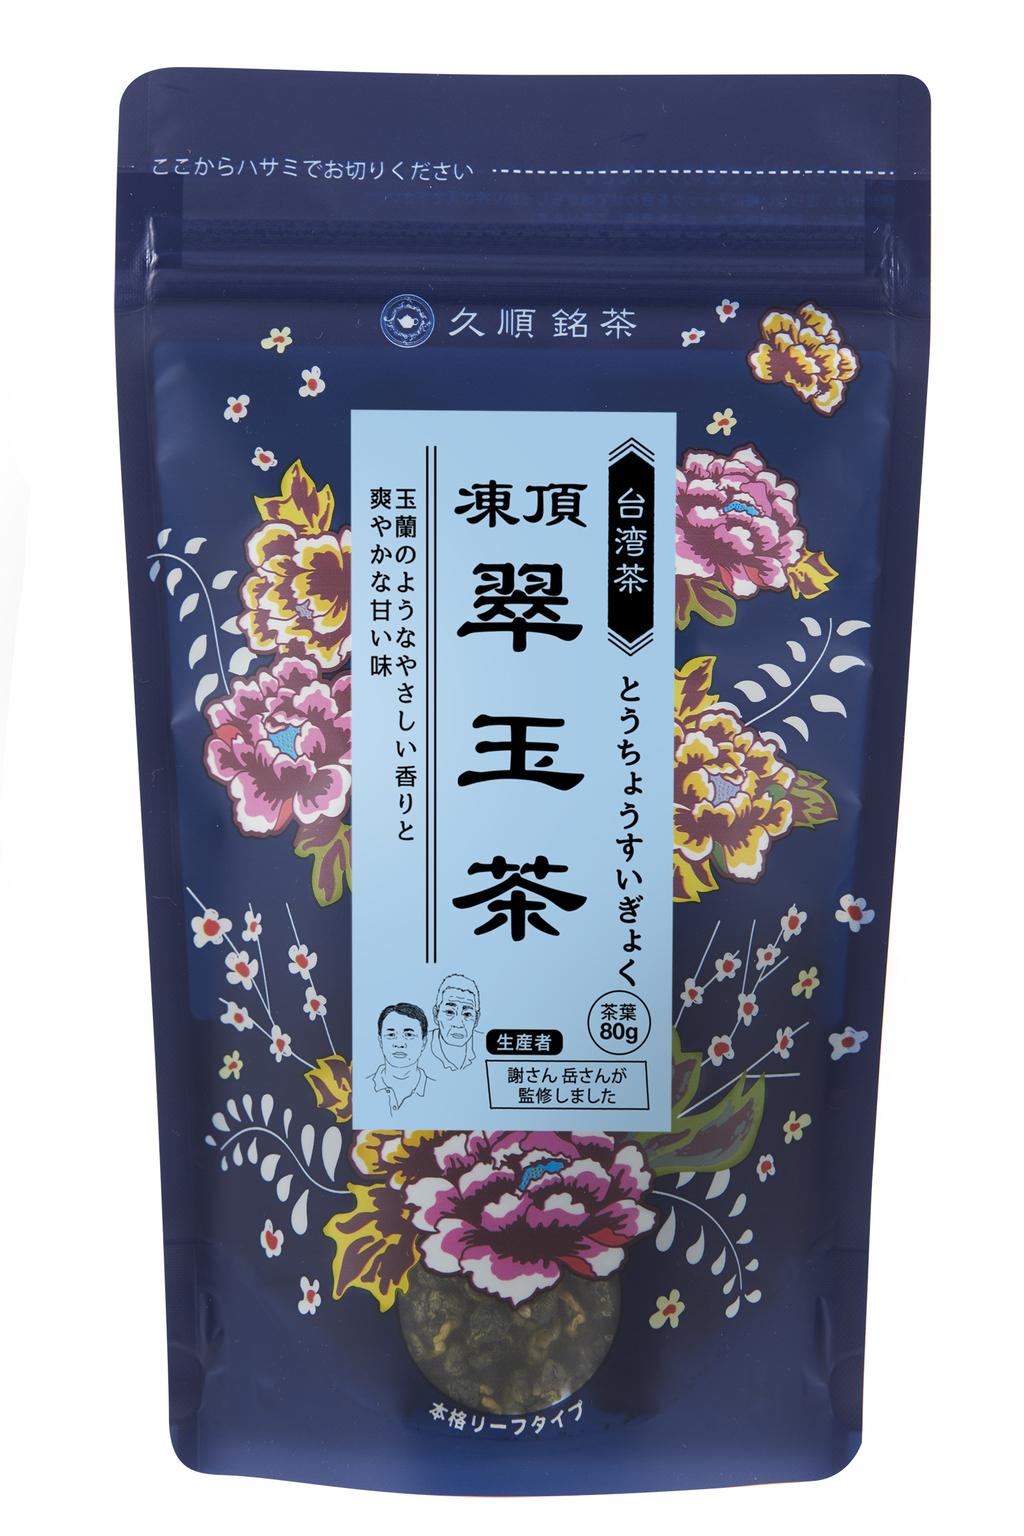 Tokyo Tea Trading 久順銘茶 凍頂翠玉茶